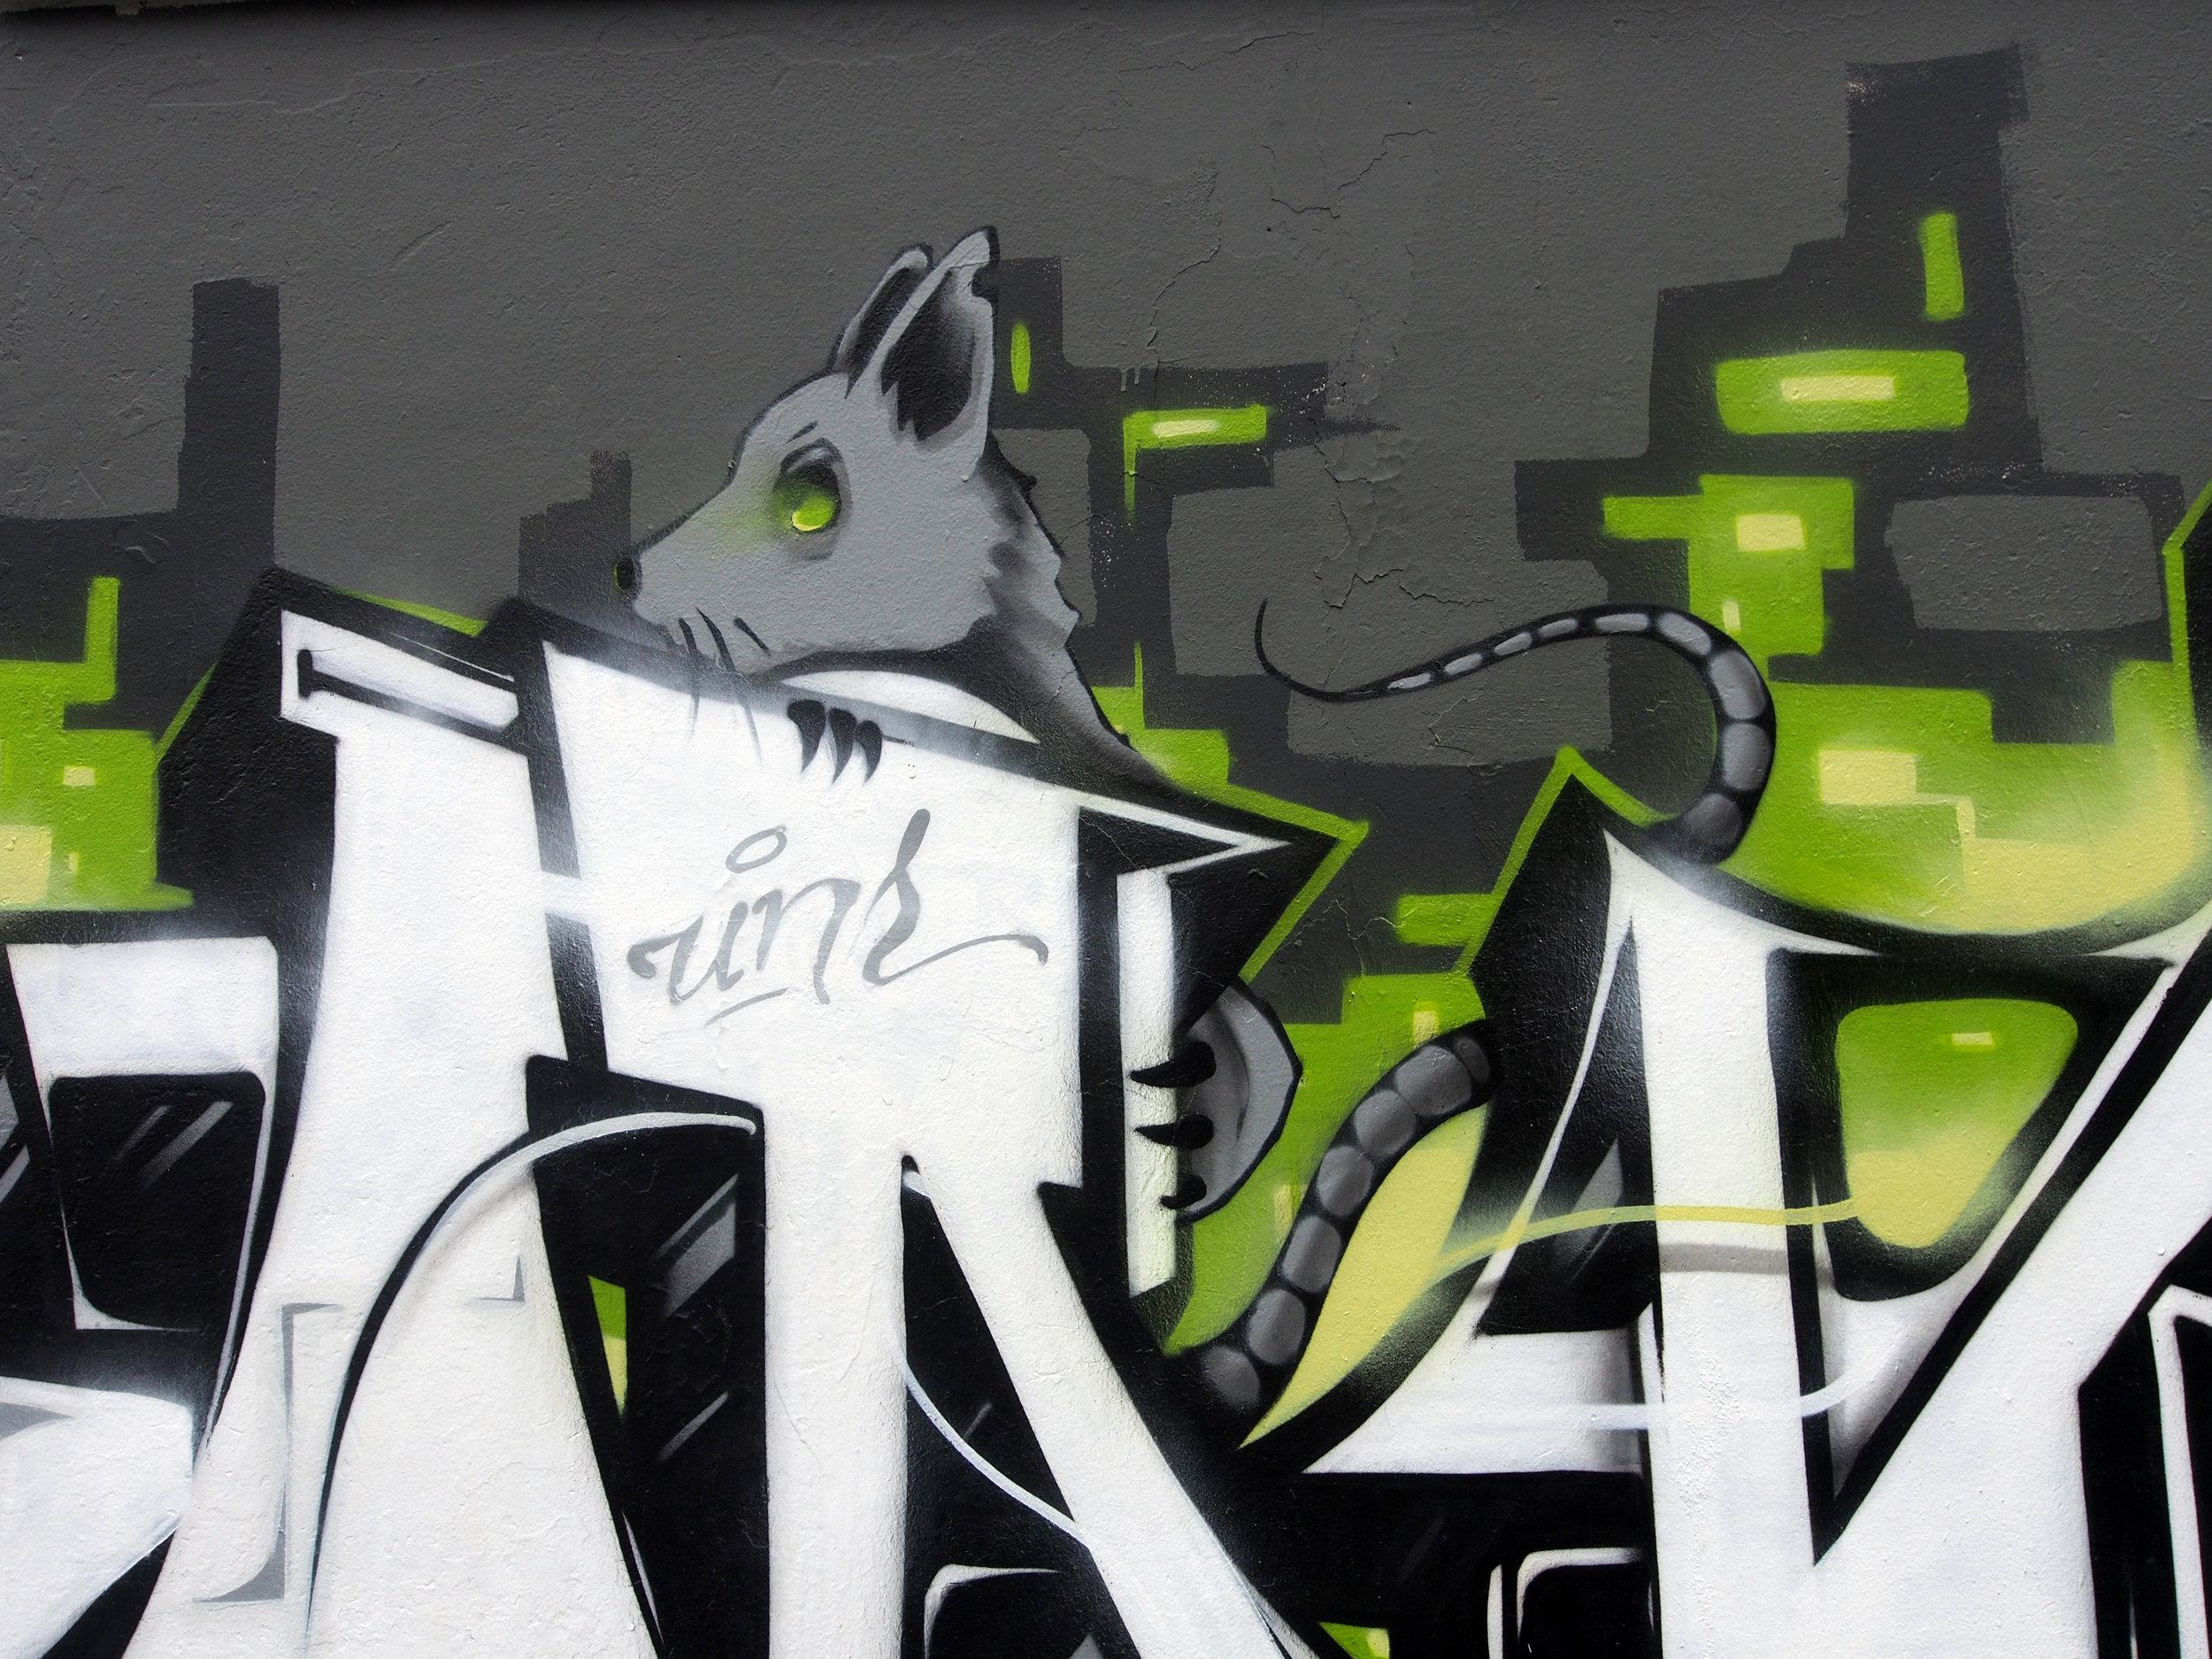 Detail of KANGO's piece. Photo: Tiffany Conklin